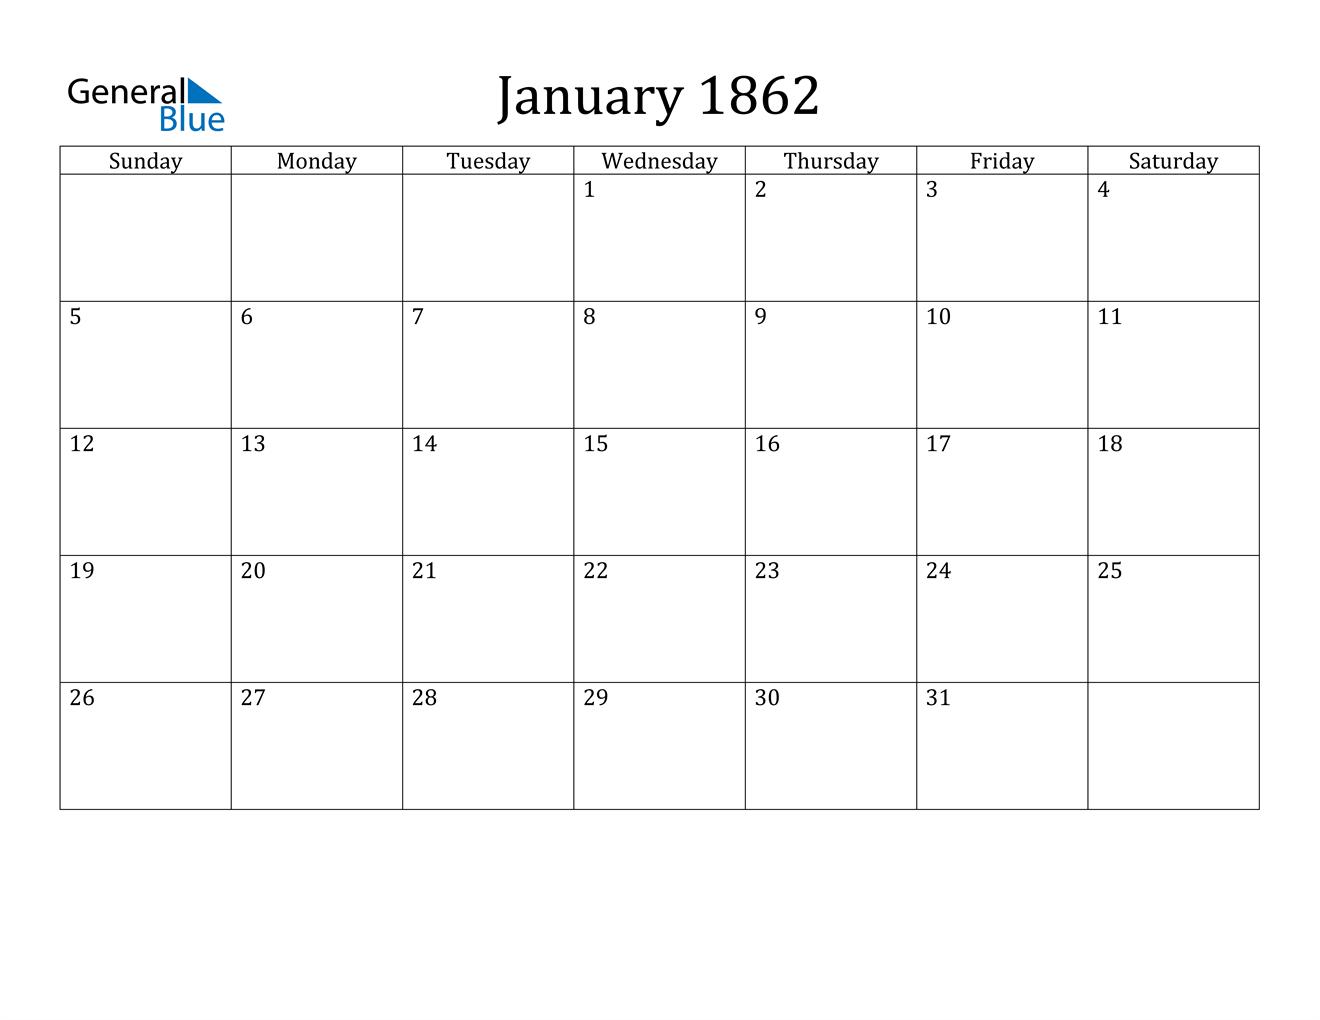 Image of January 1862 Calendar